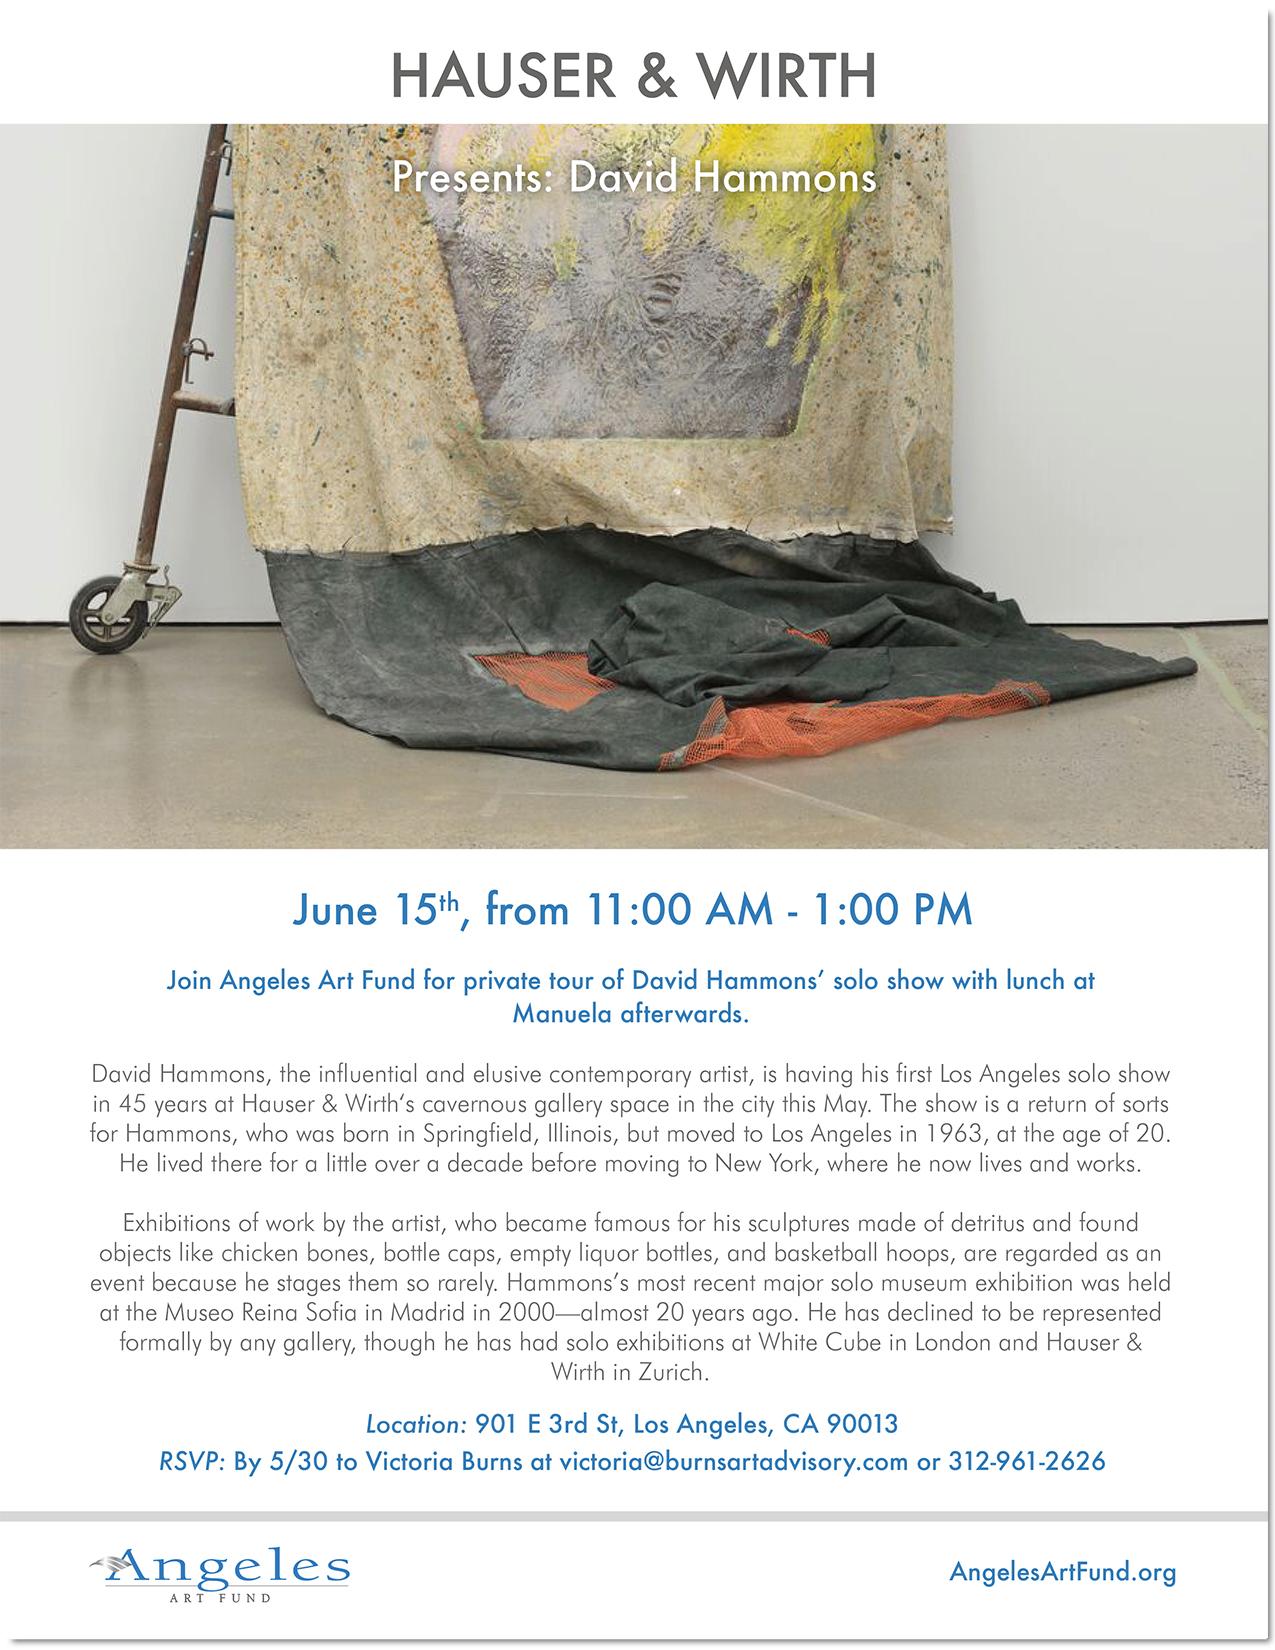 Angeles Art Fund Invites_border14.jpg